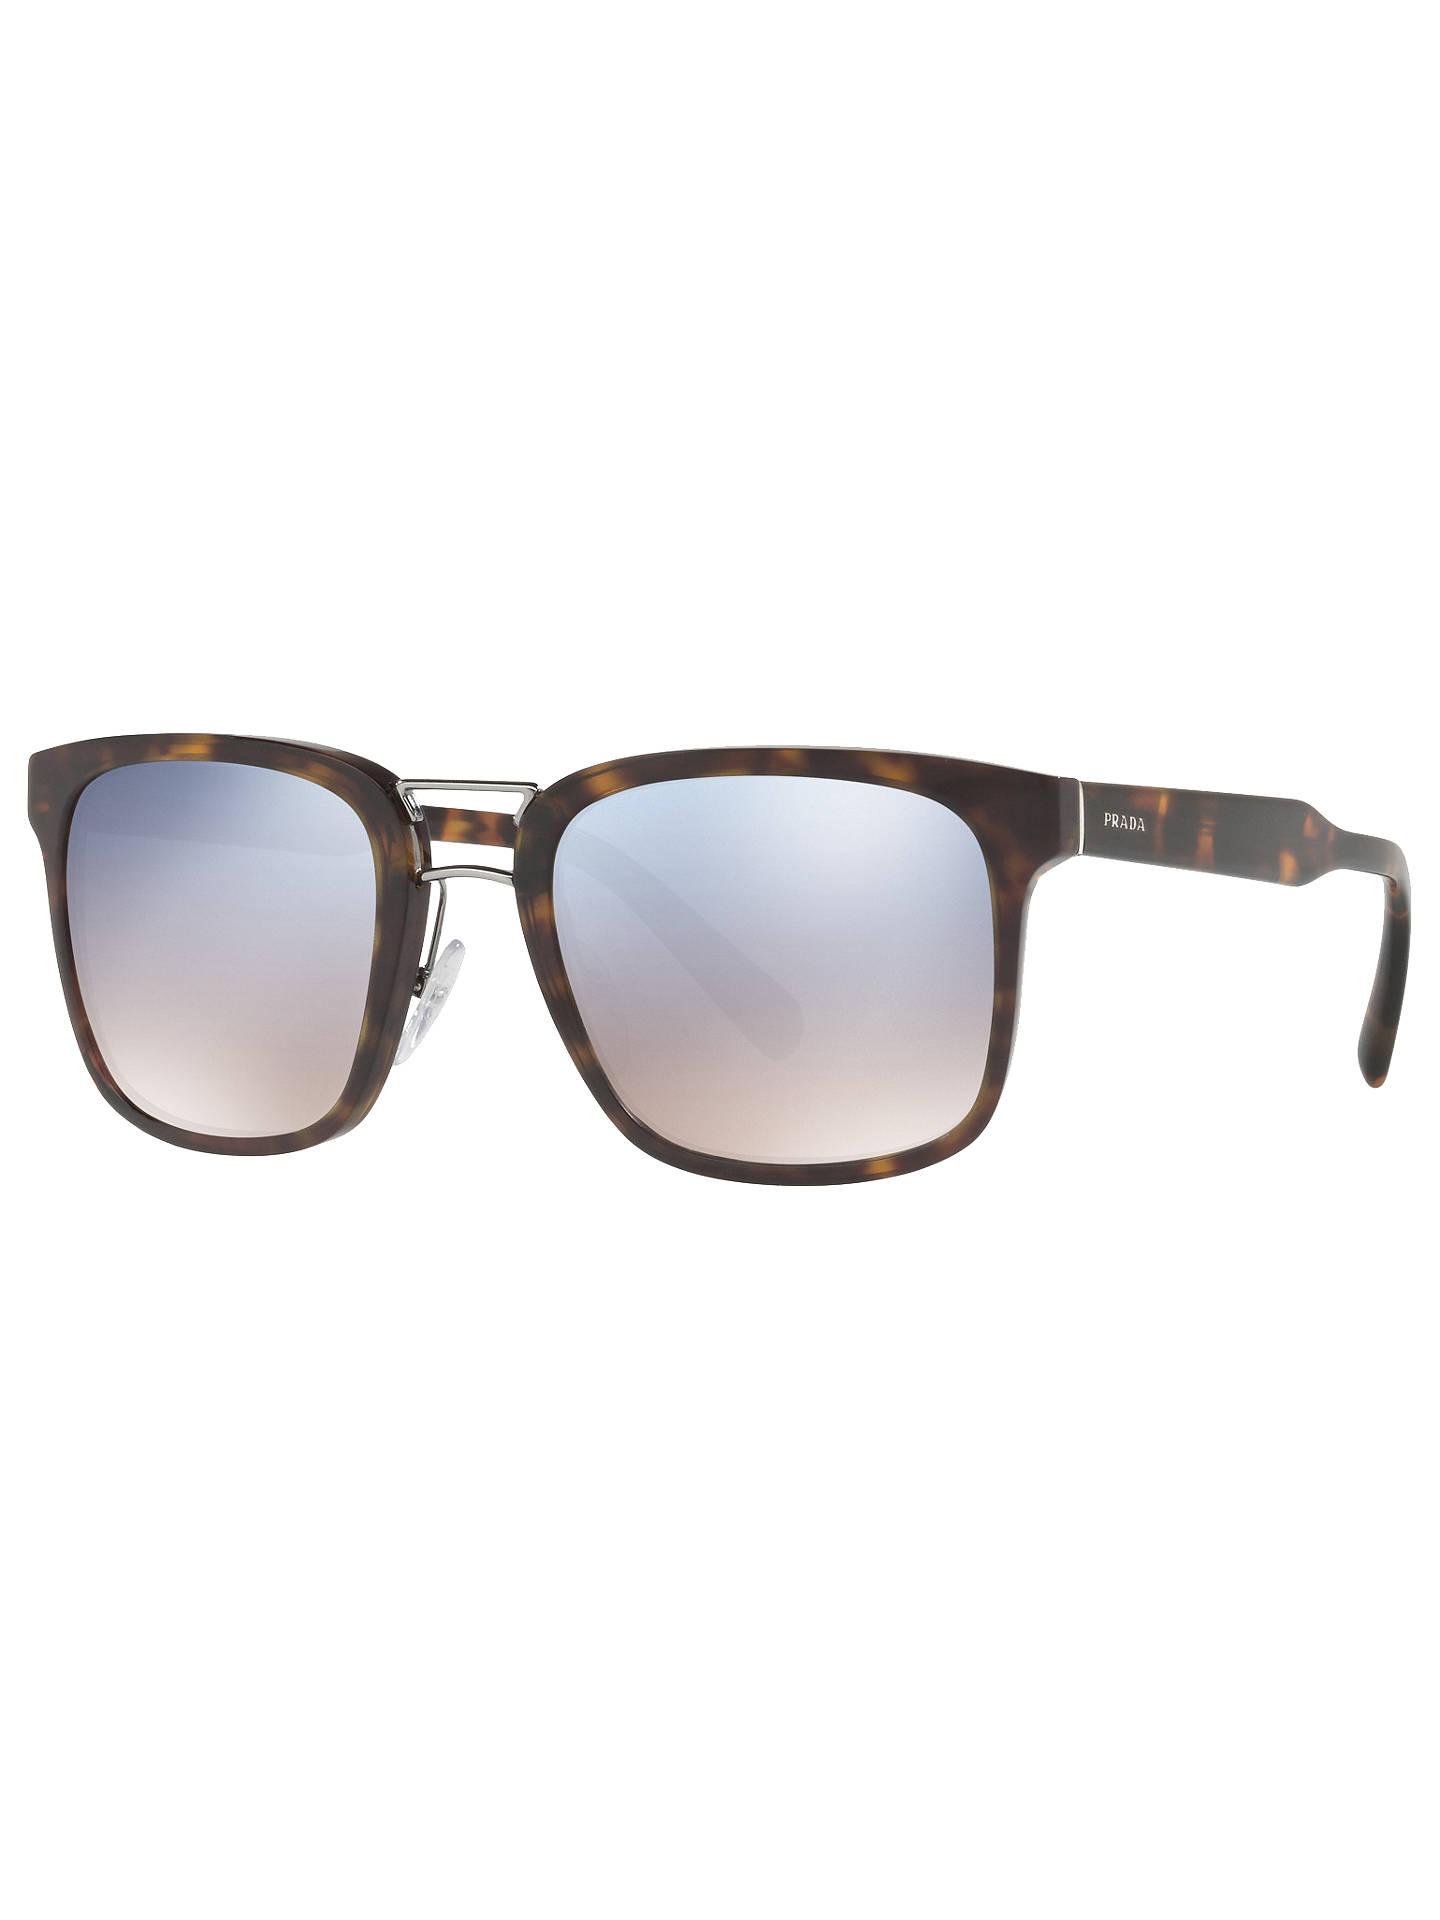 823a689f841 Buy Prada PR 14TS Square Sunglasses